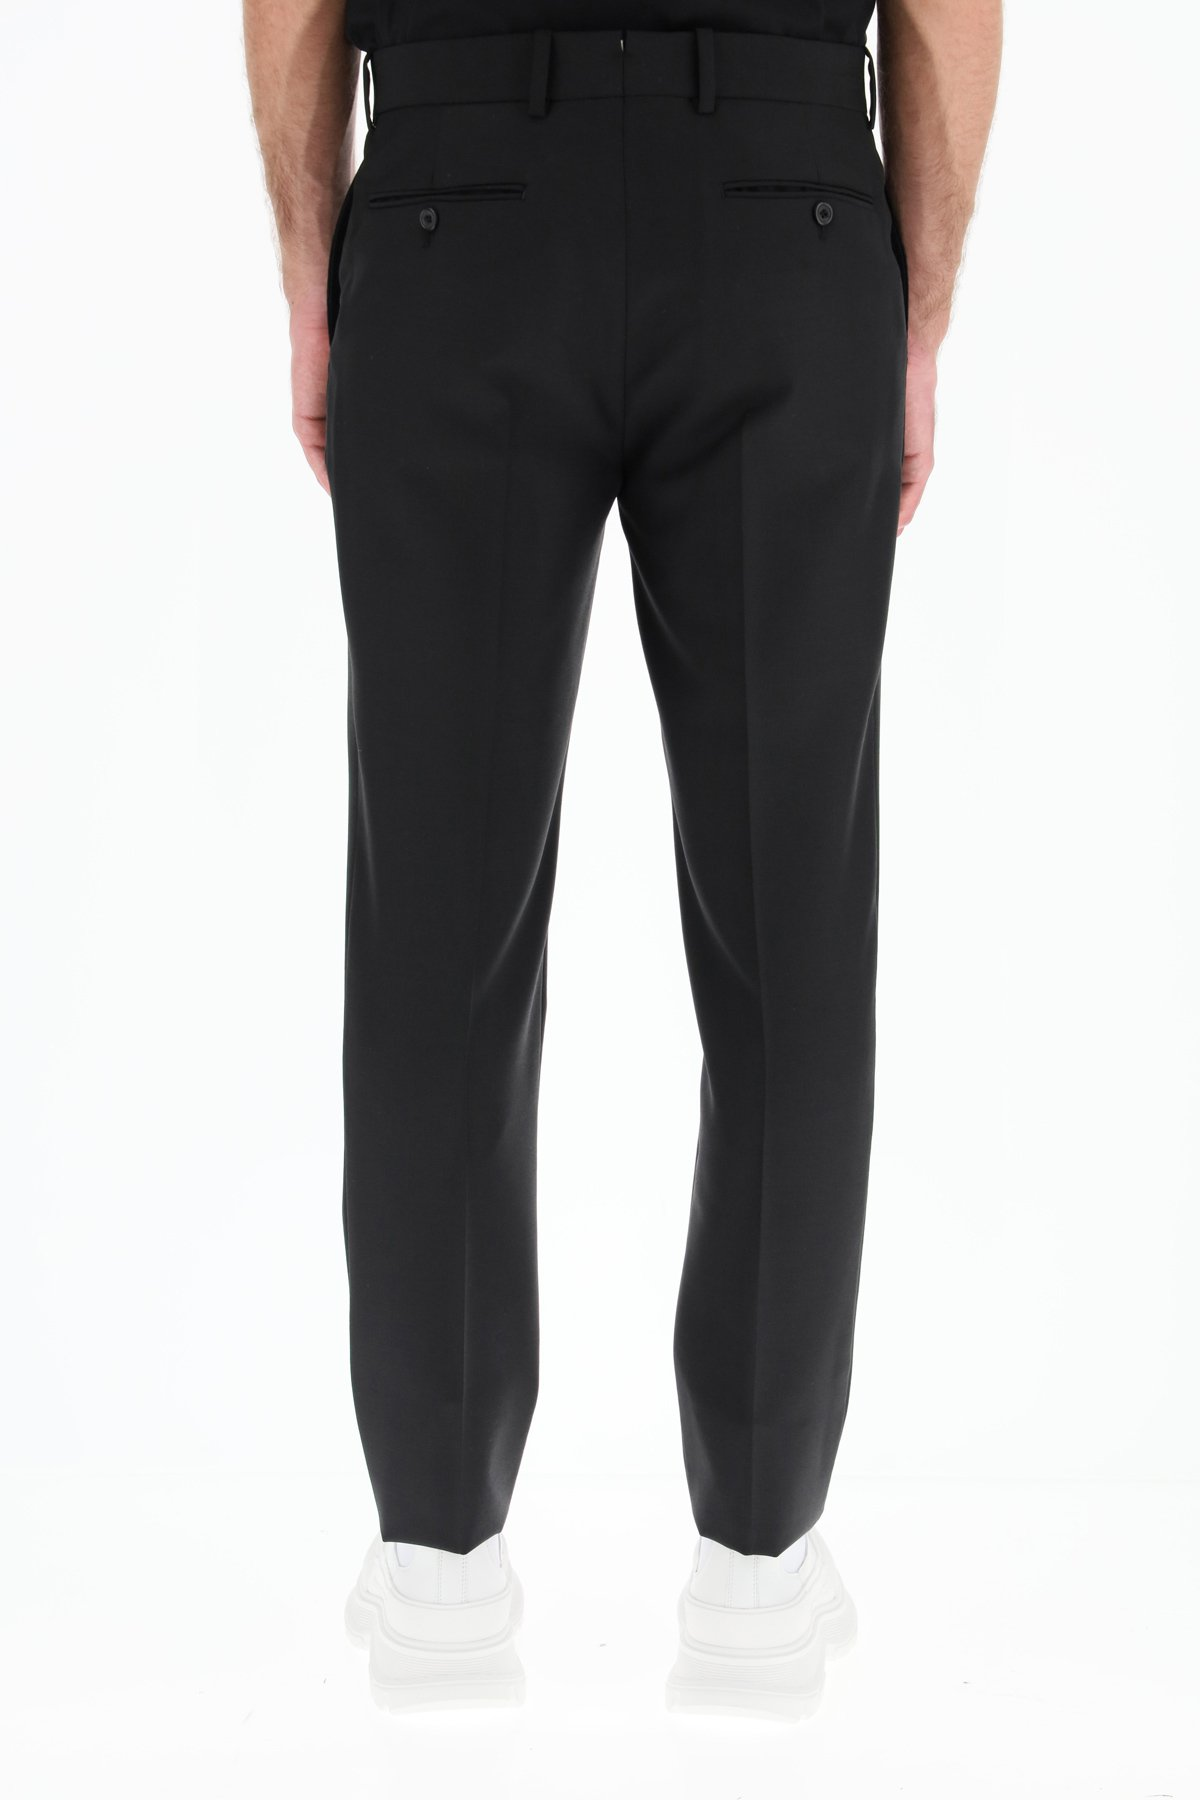 Alexander mcqueen pantaloni sartoriali in lana